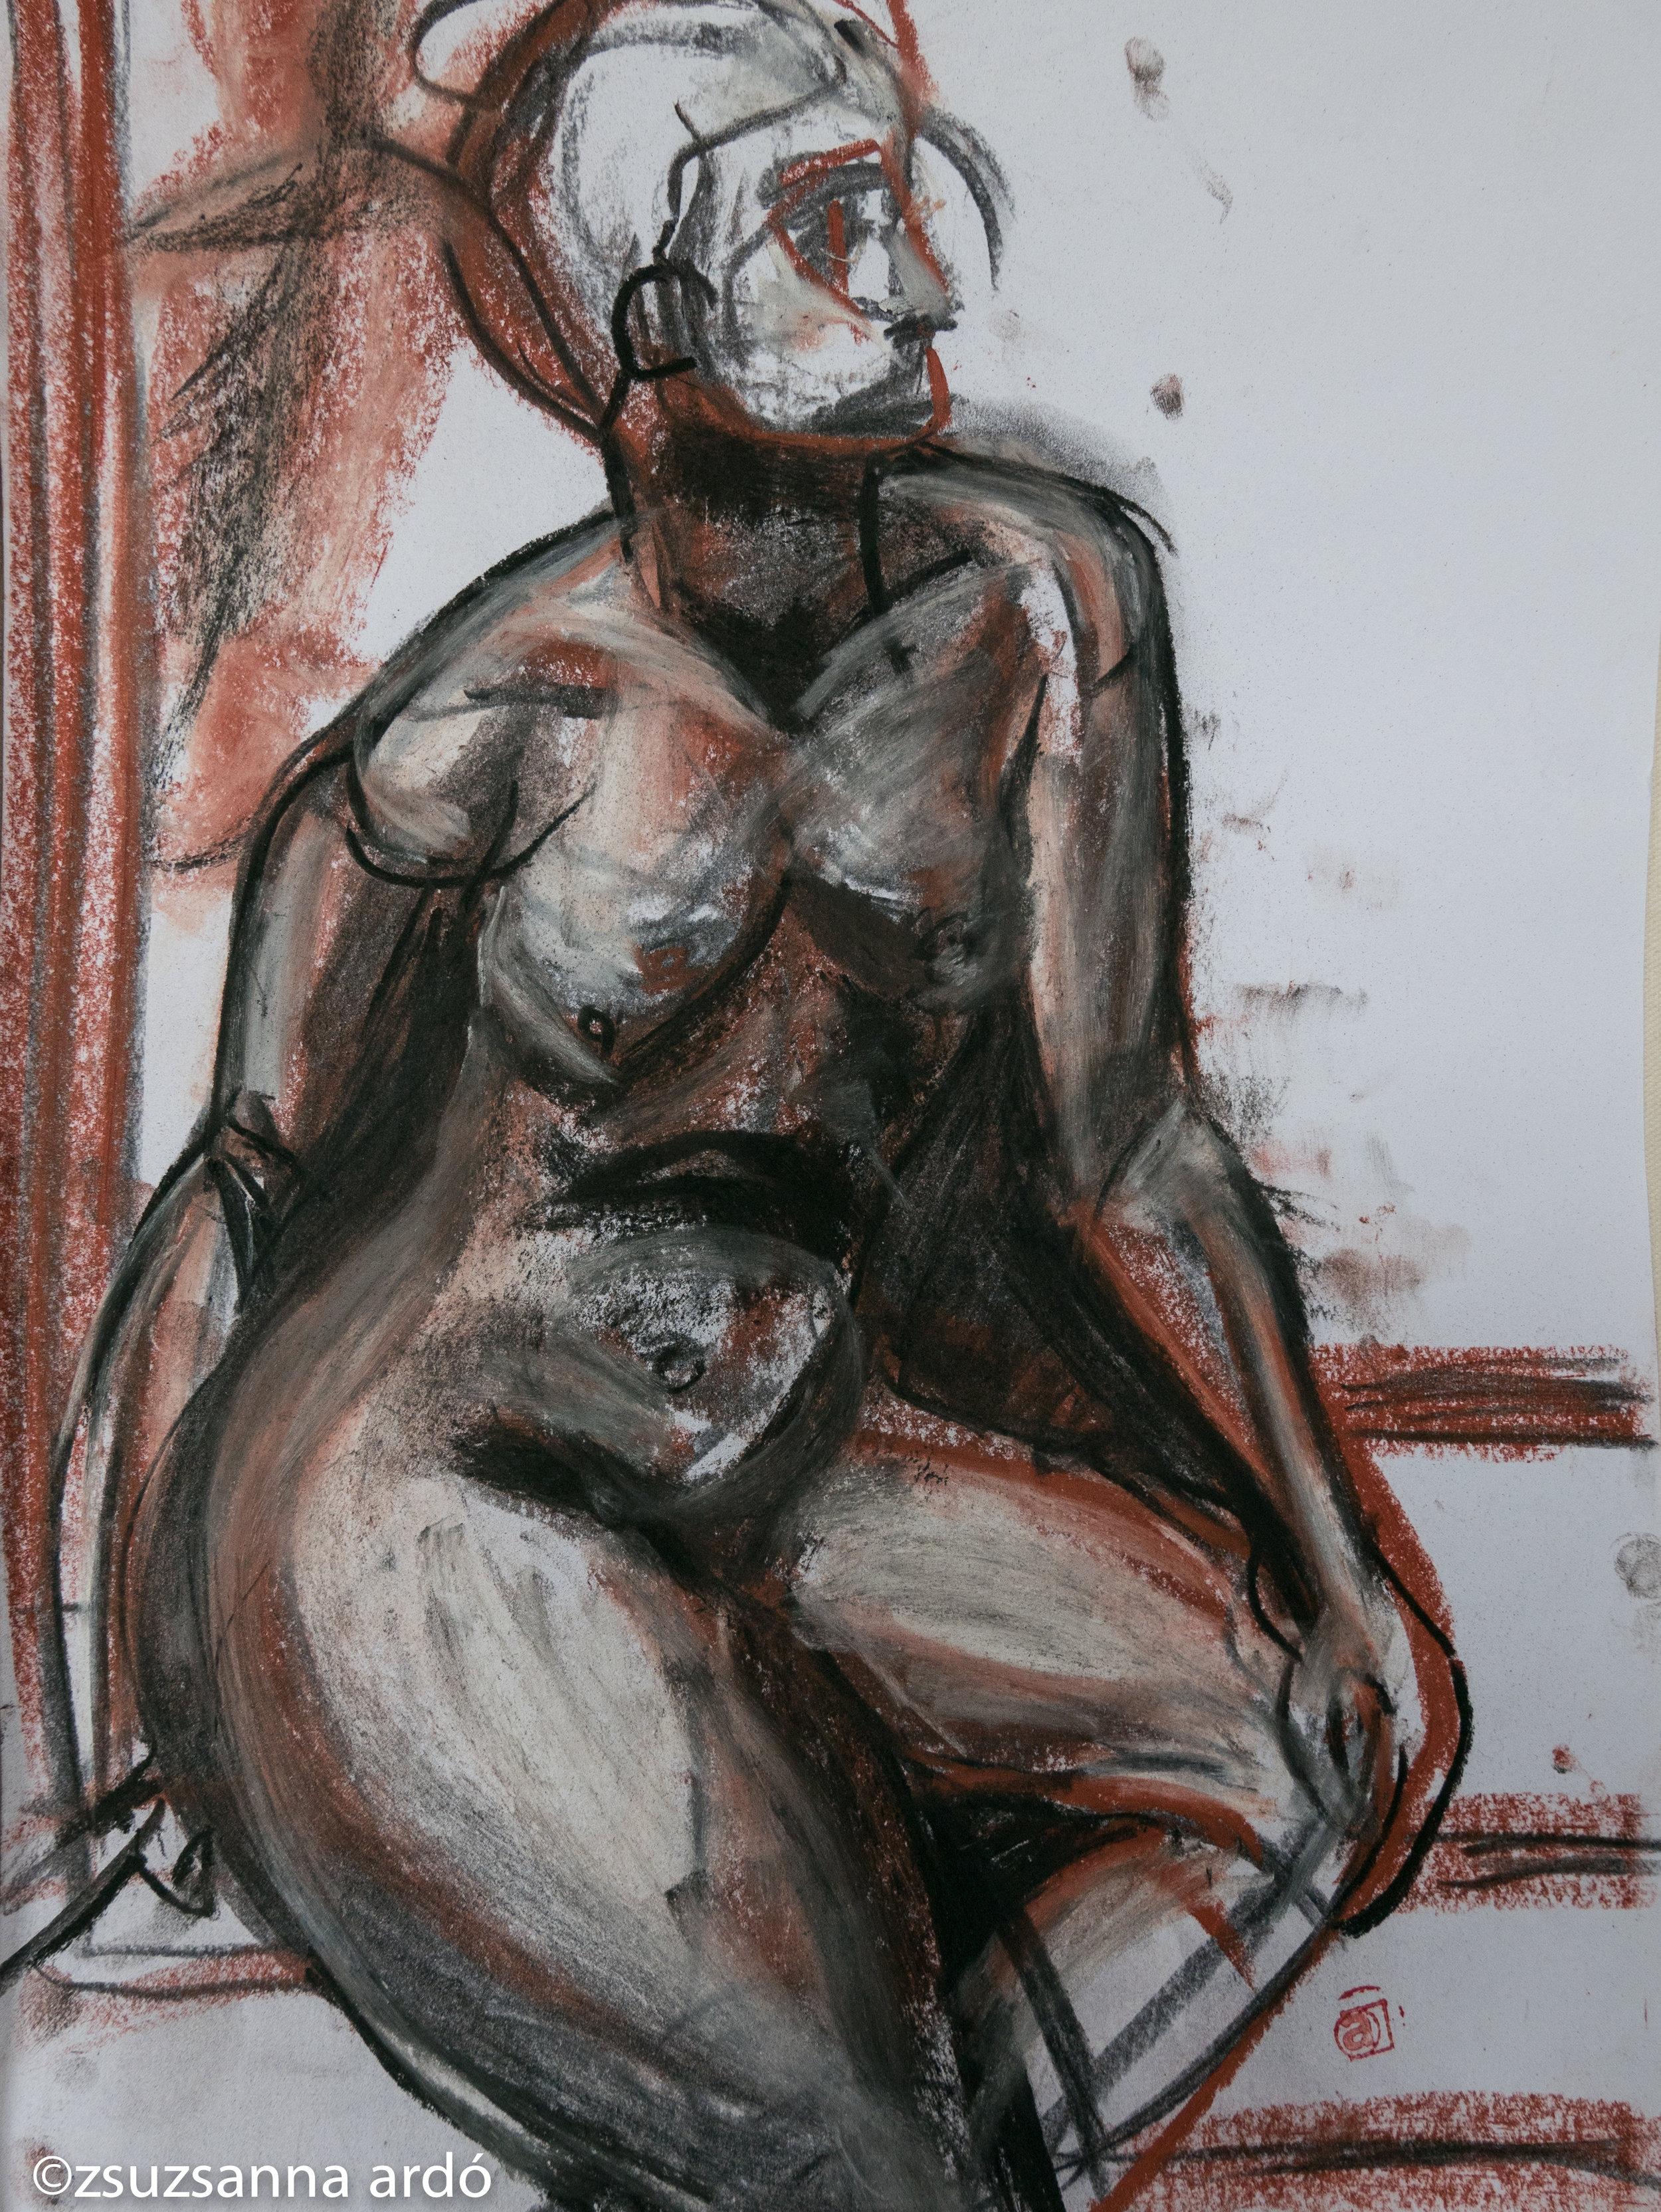 17 UK lon RA nudes 5Spt©Zsuzsanna Ardó-2.jpg